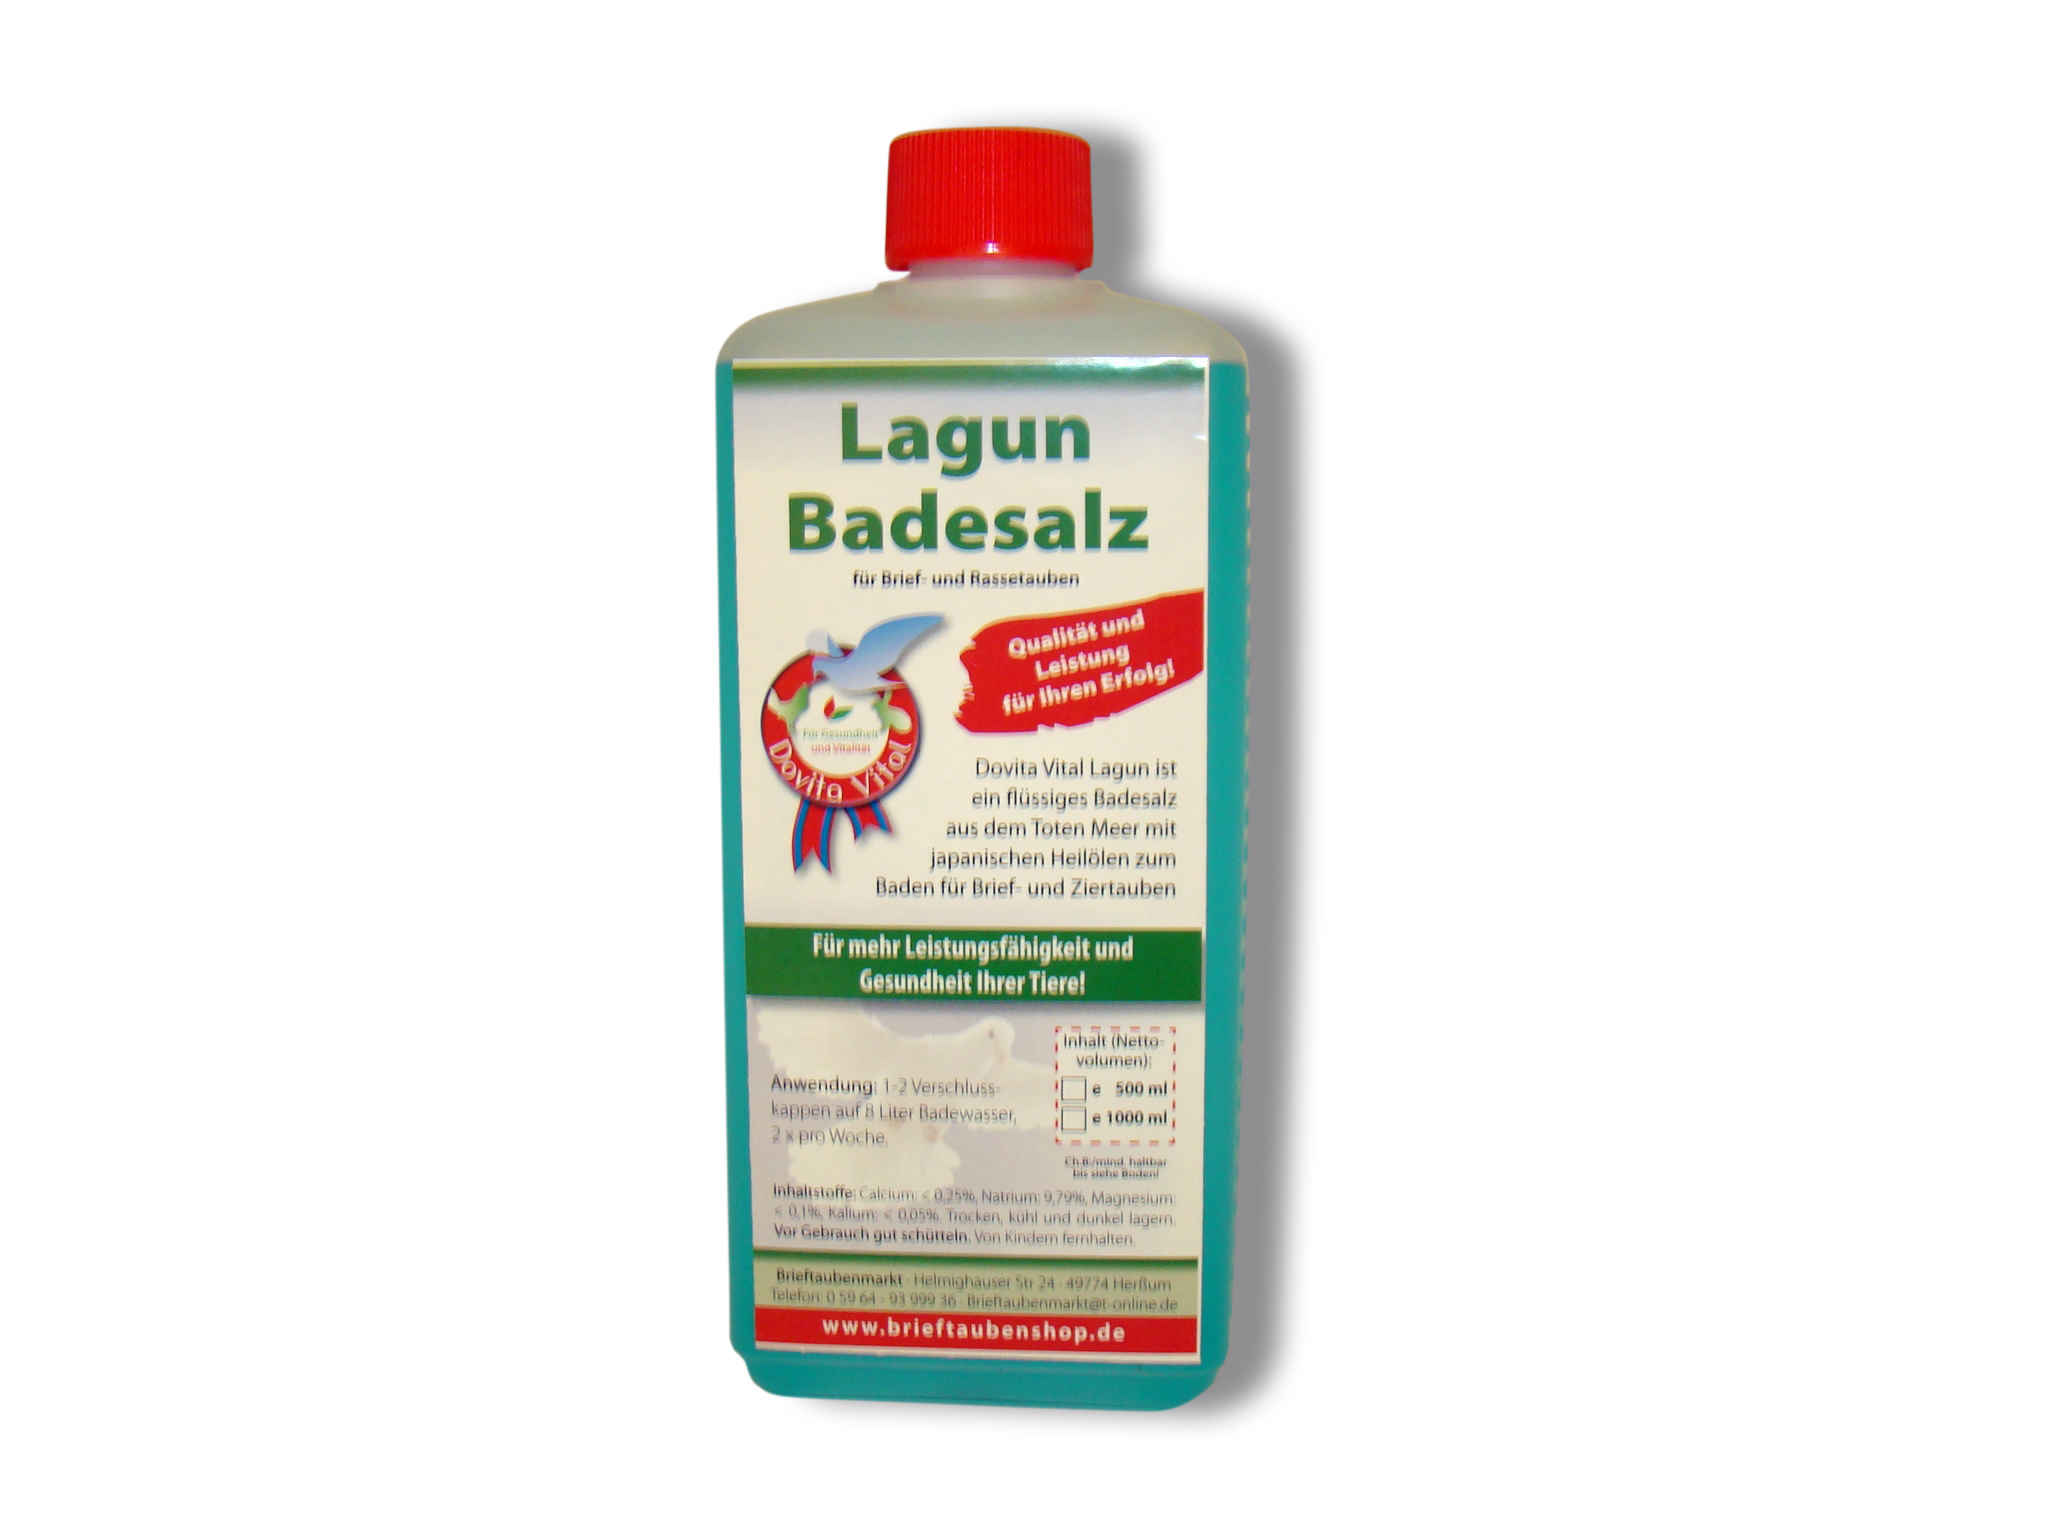 Dovita Vital Lagun Badesalz 500ml